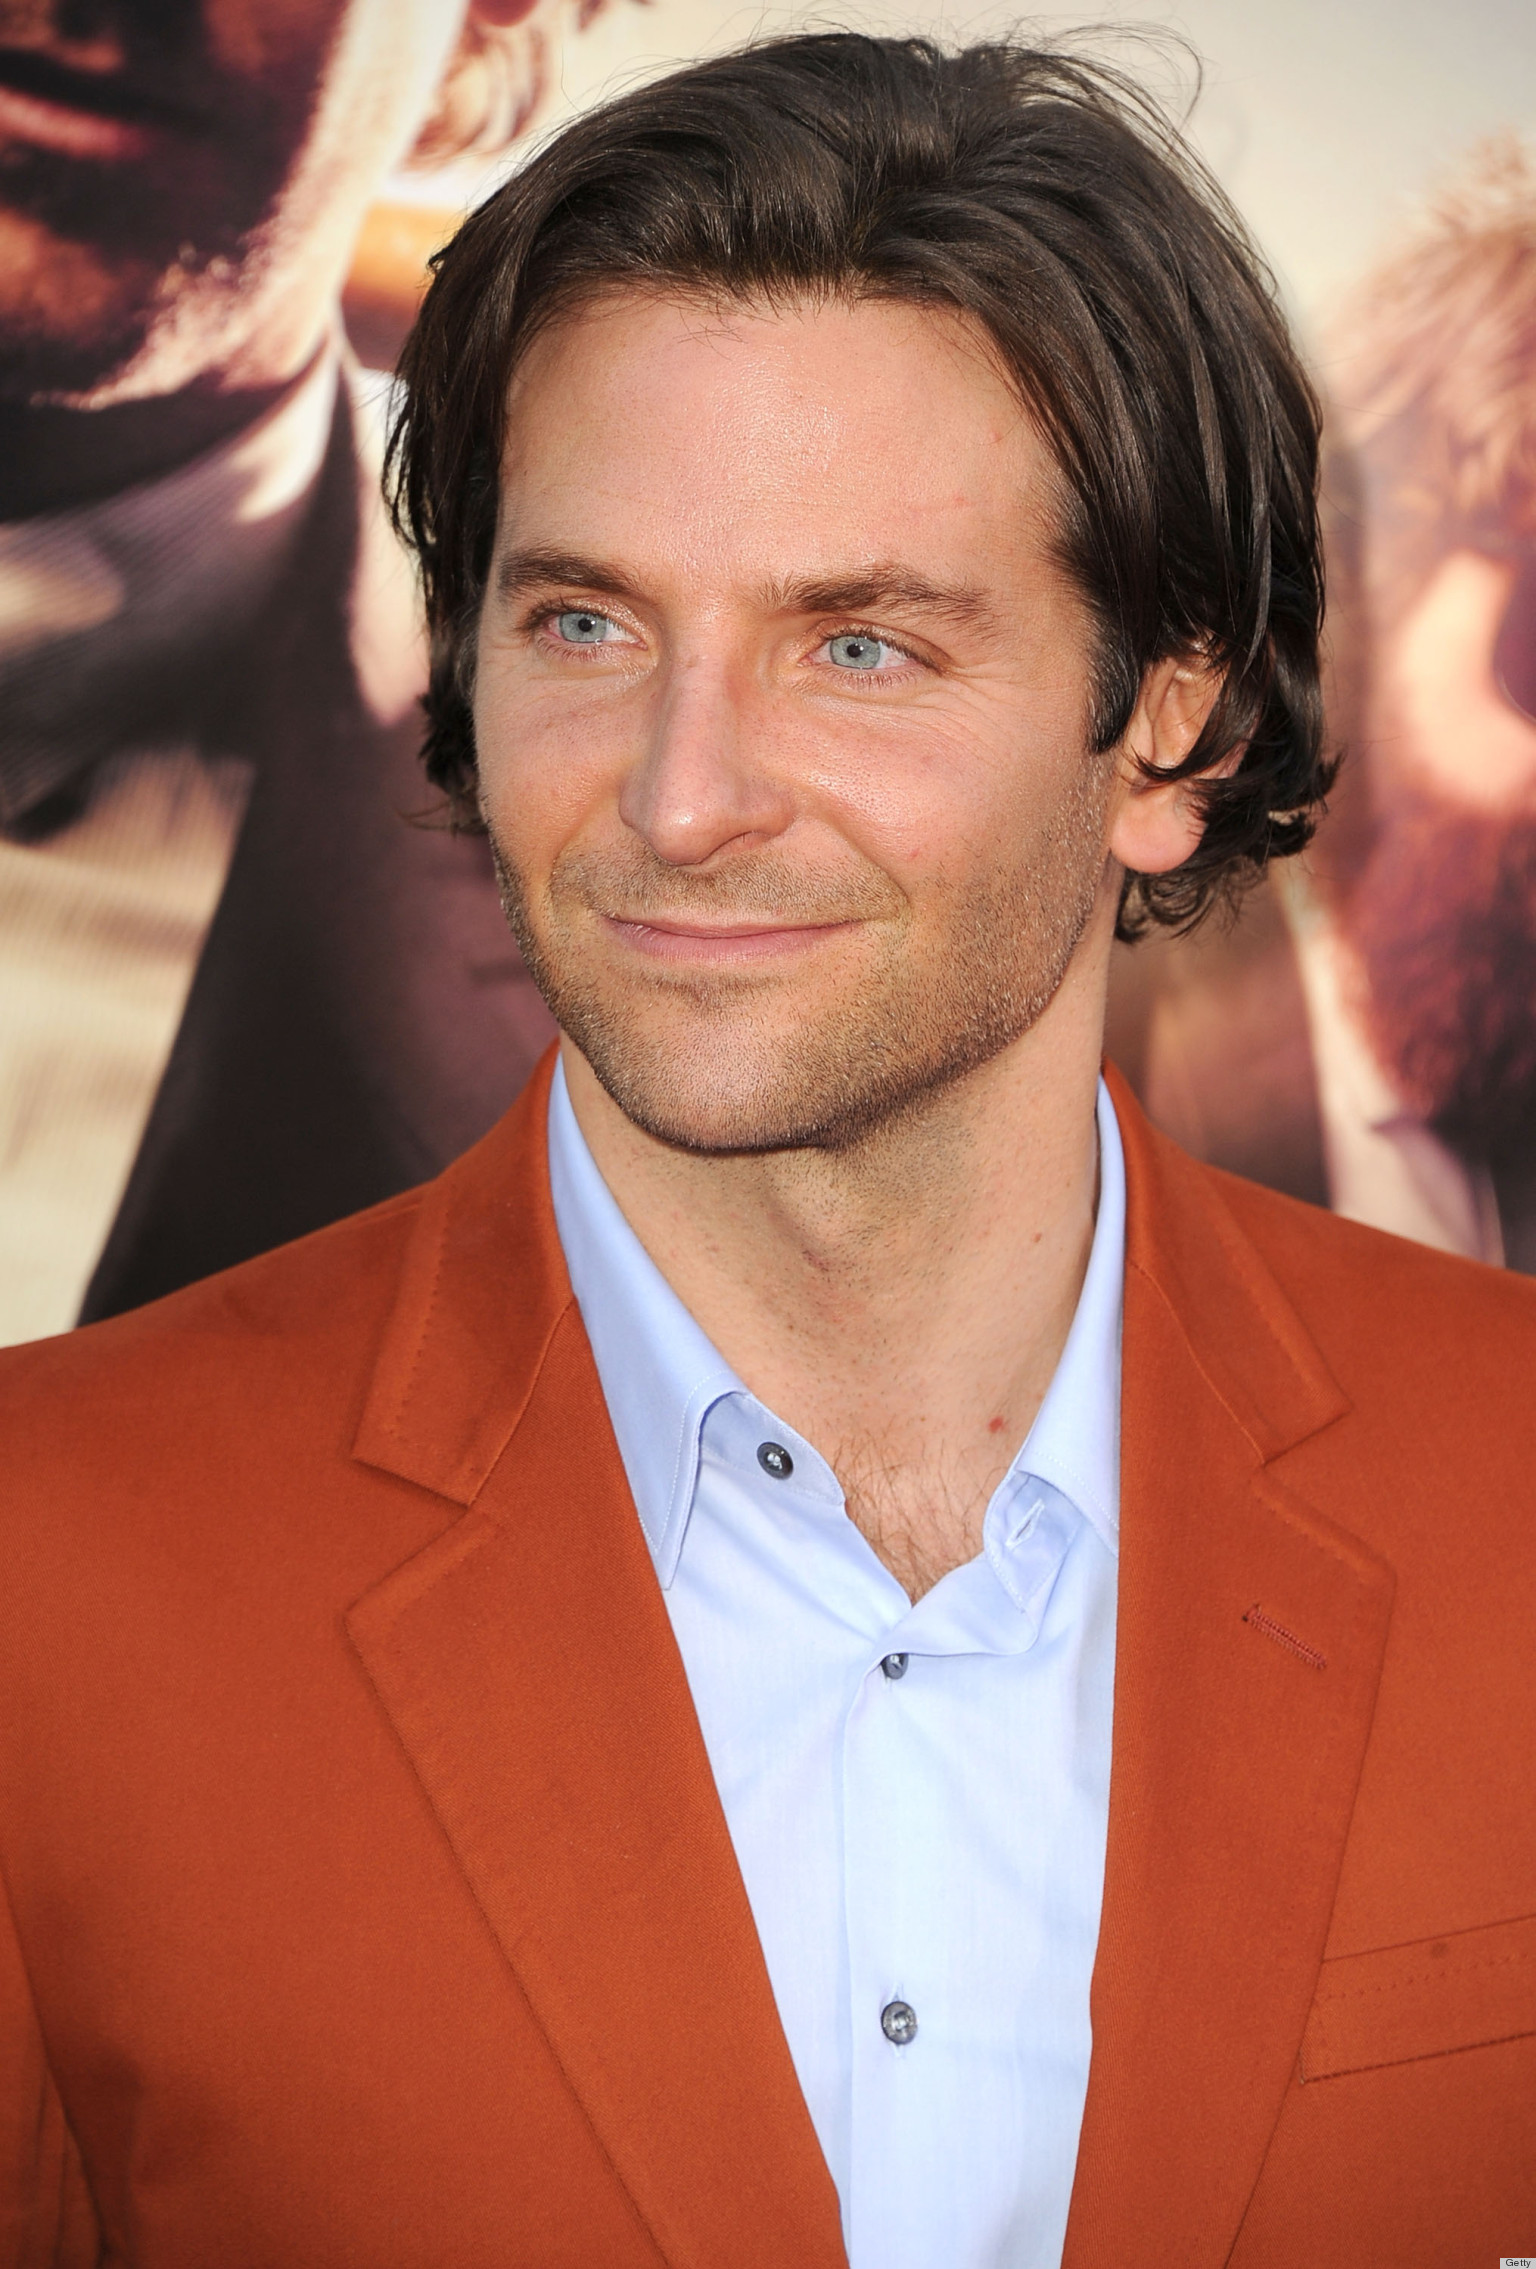 Bradley Cooper S Hair Is Short Again And We Re Loving It